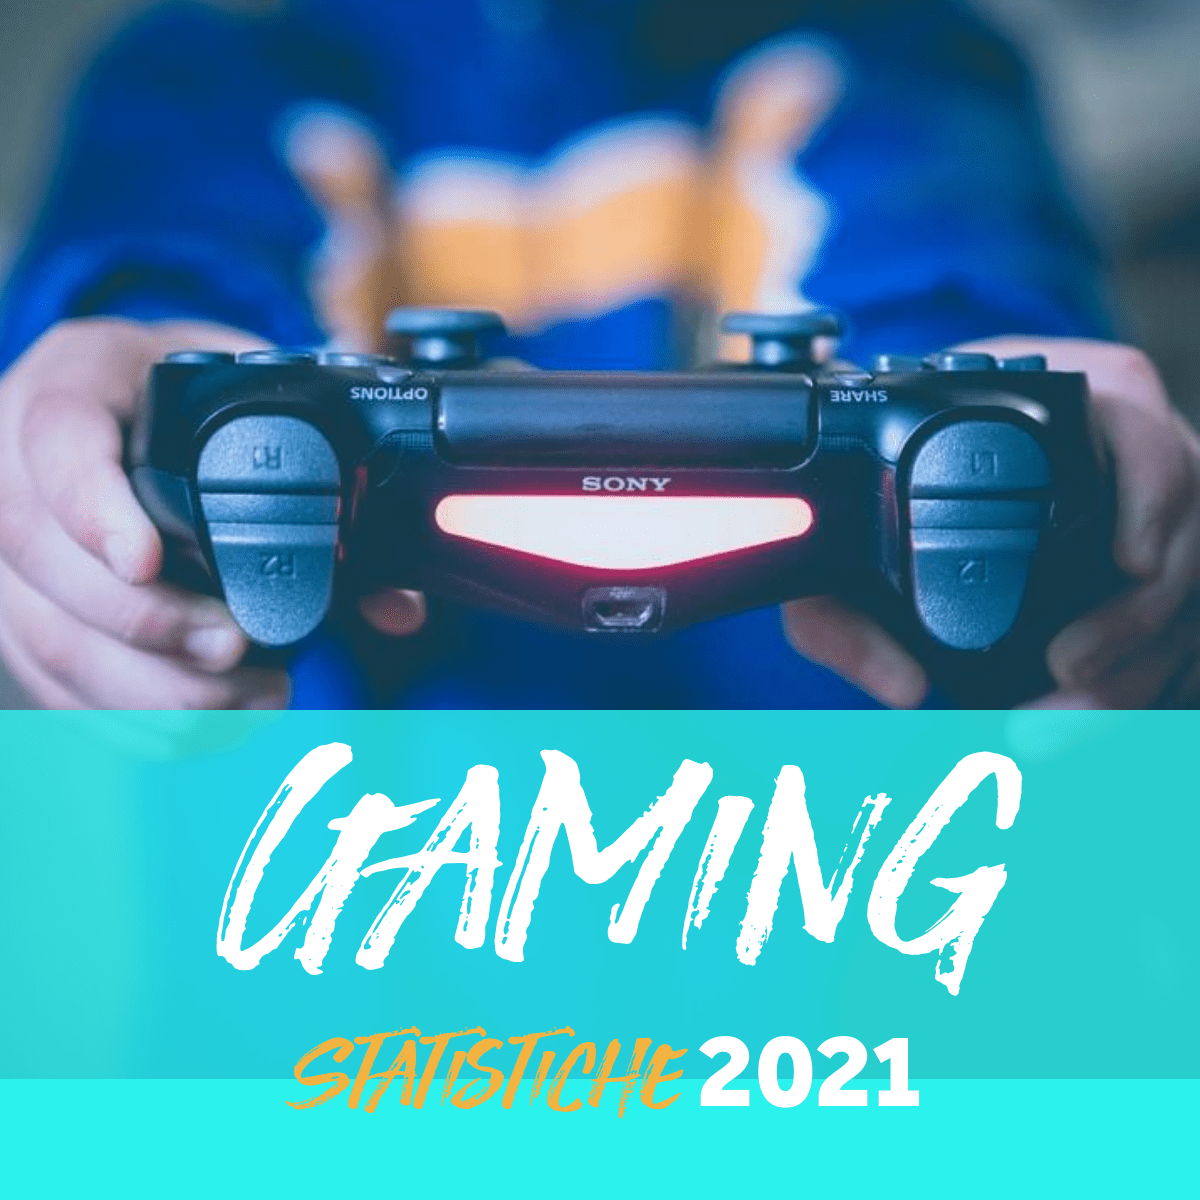 statistiche gaming 2021 blog post